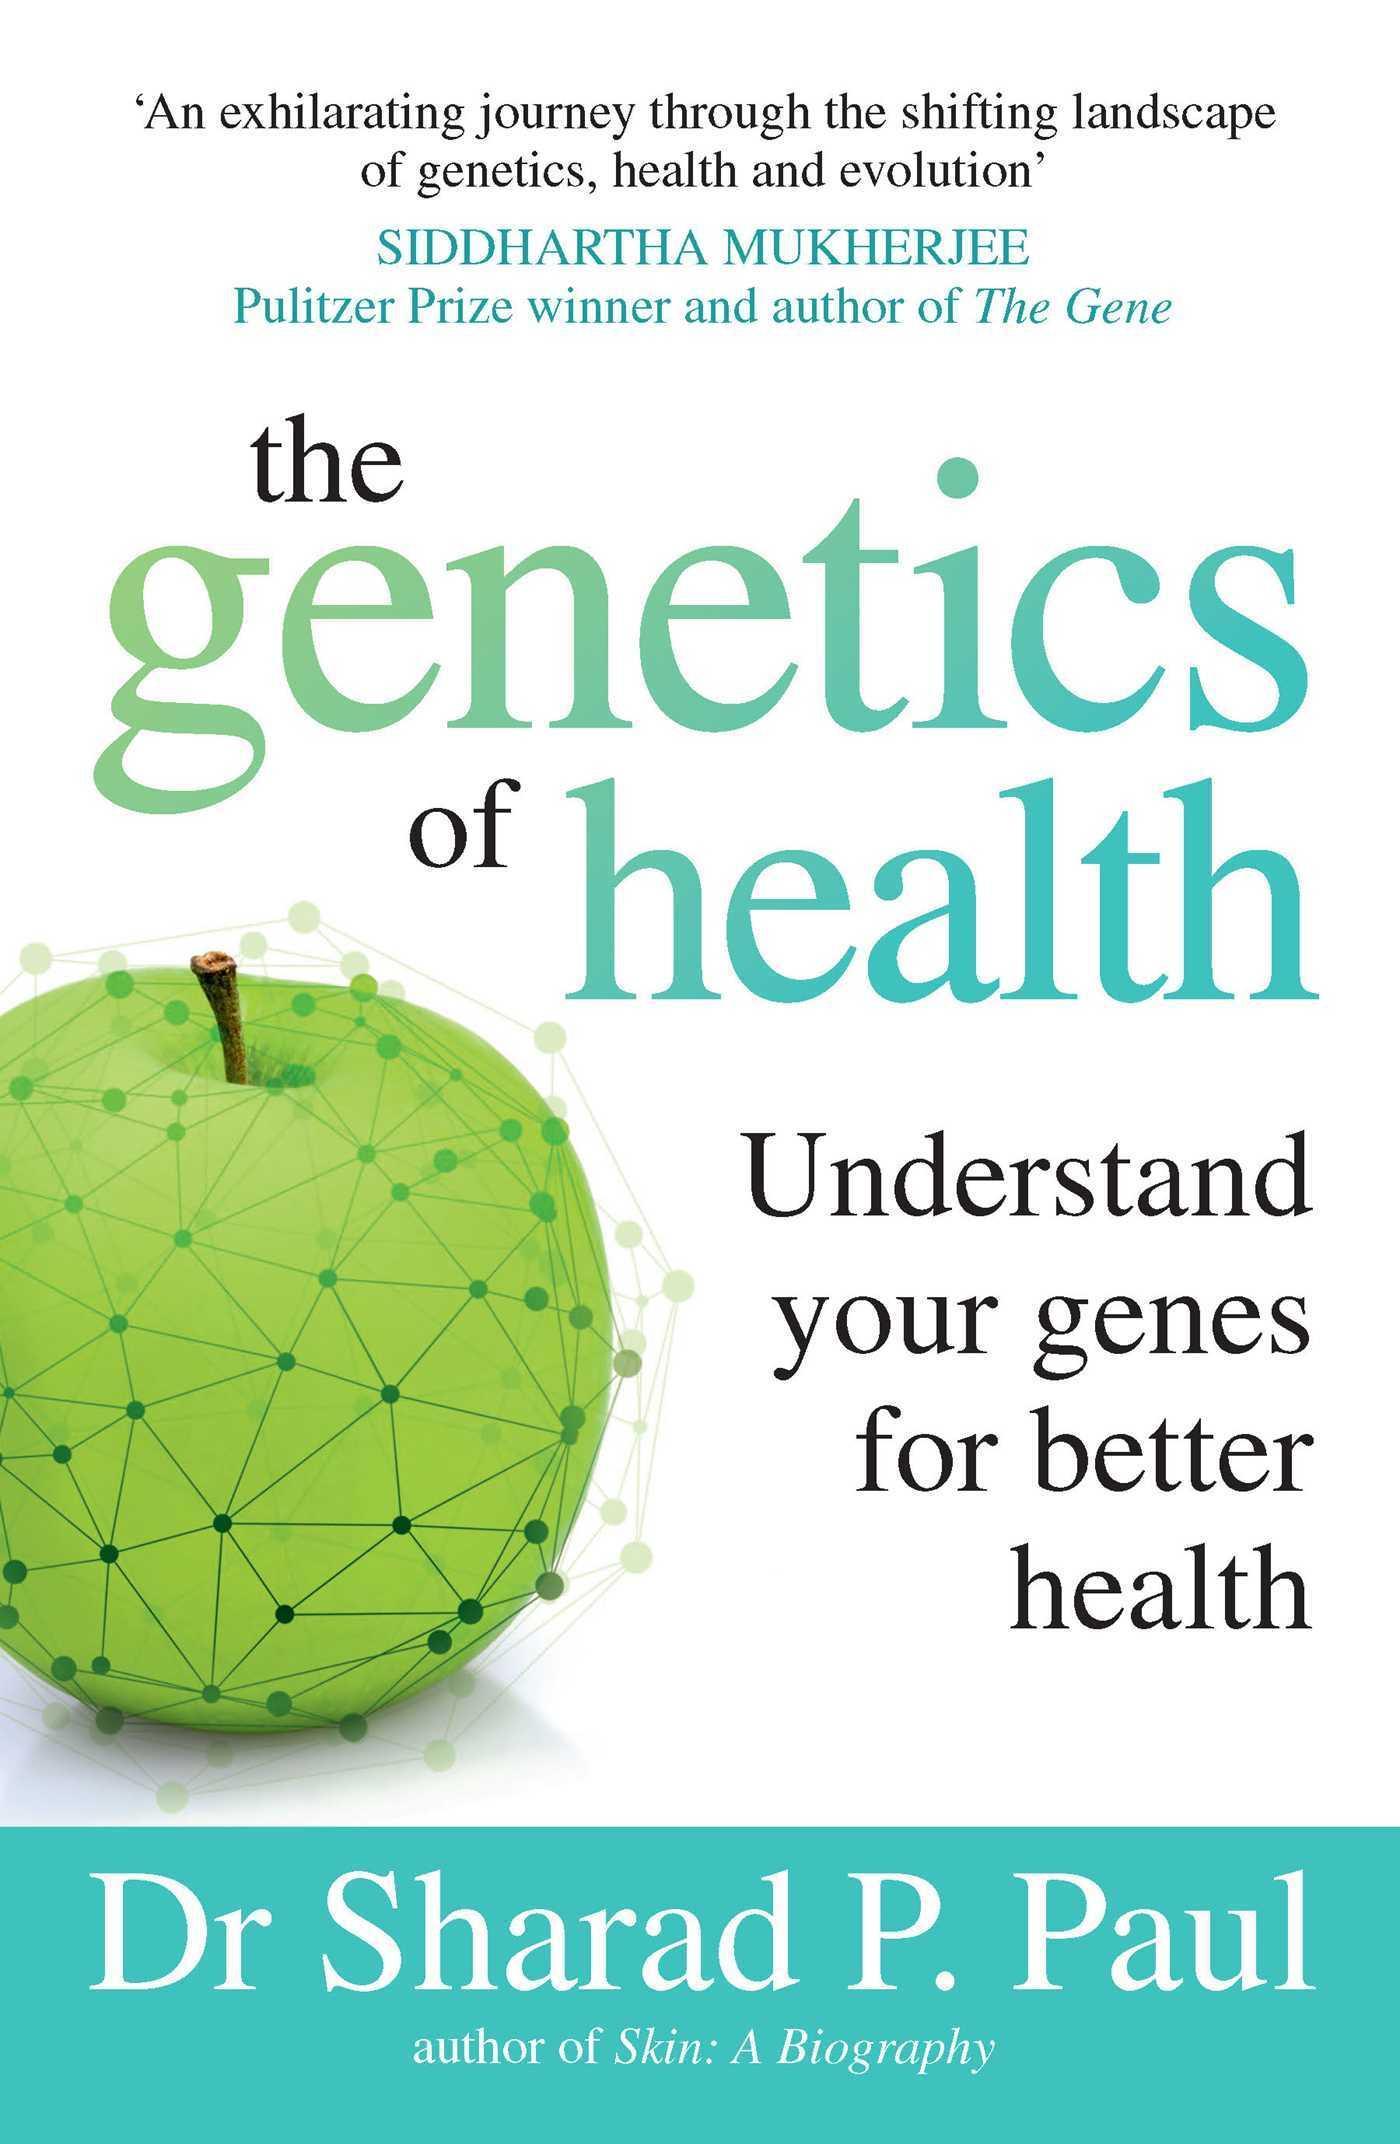 The Genetics of Health: Understand Your Genes forBetterHealth